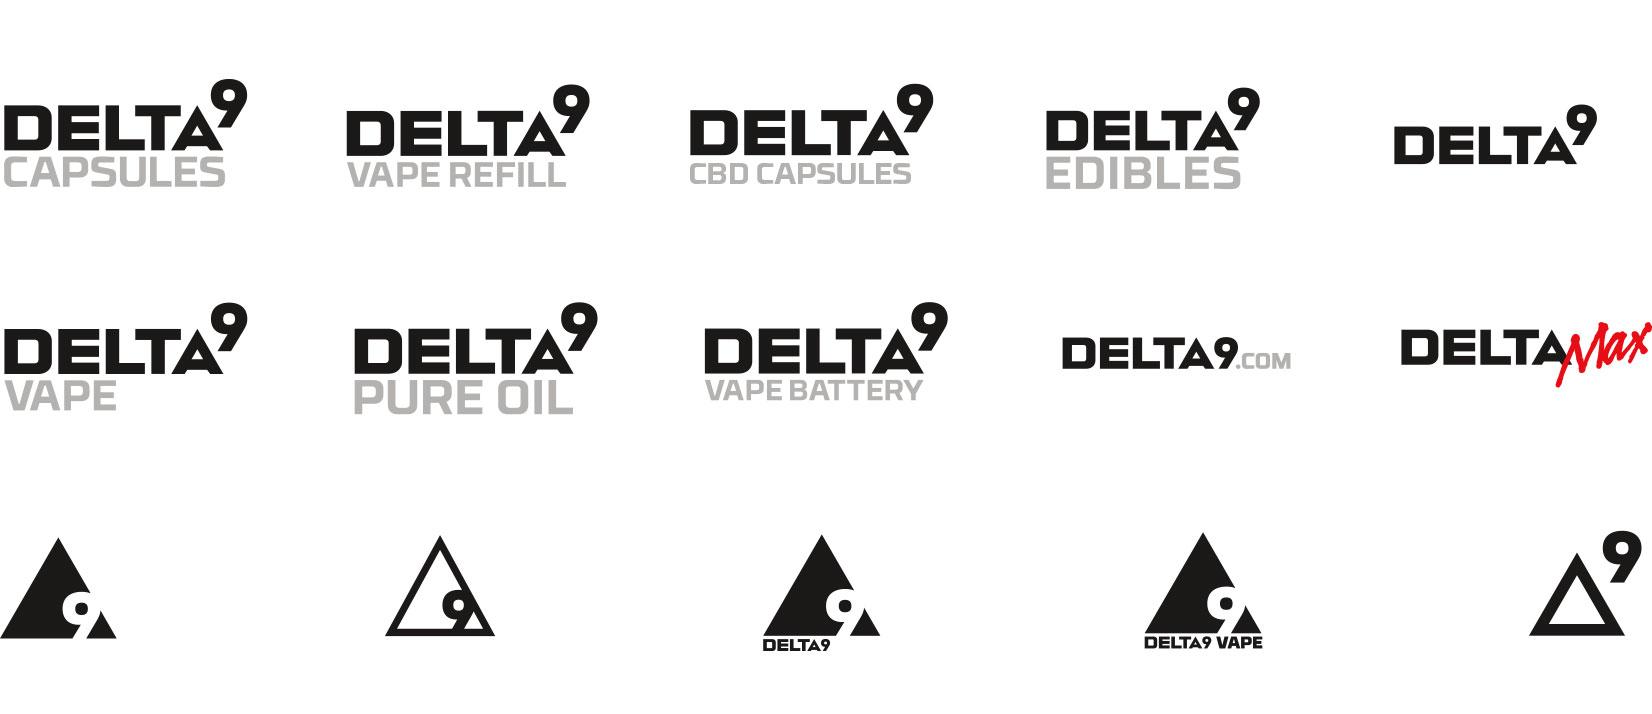 Delta9 product logos